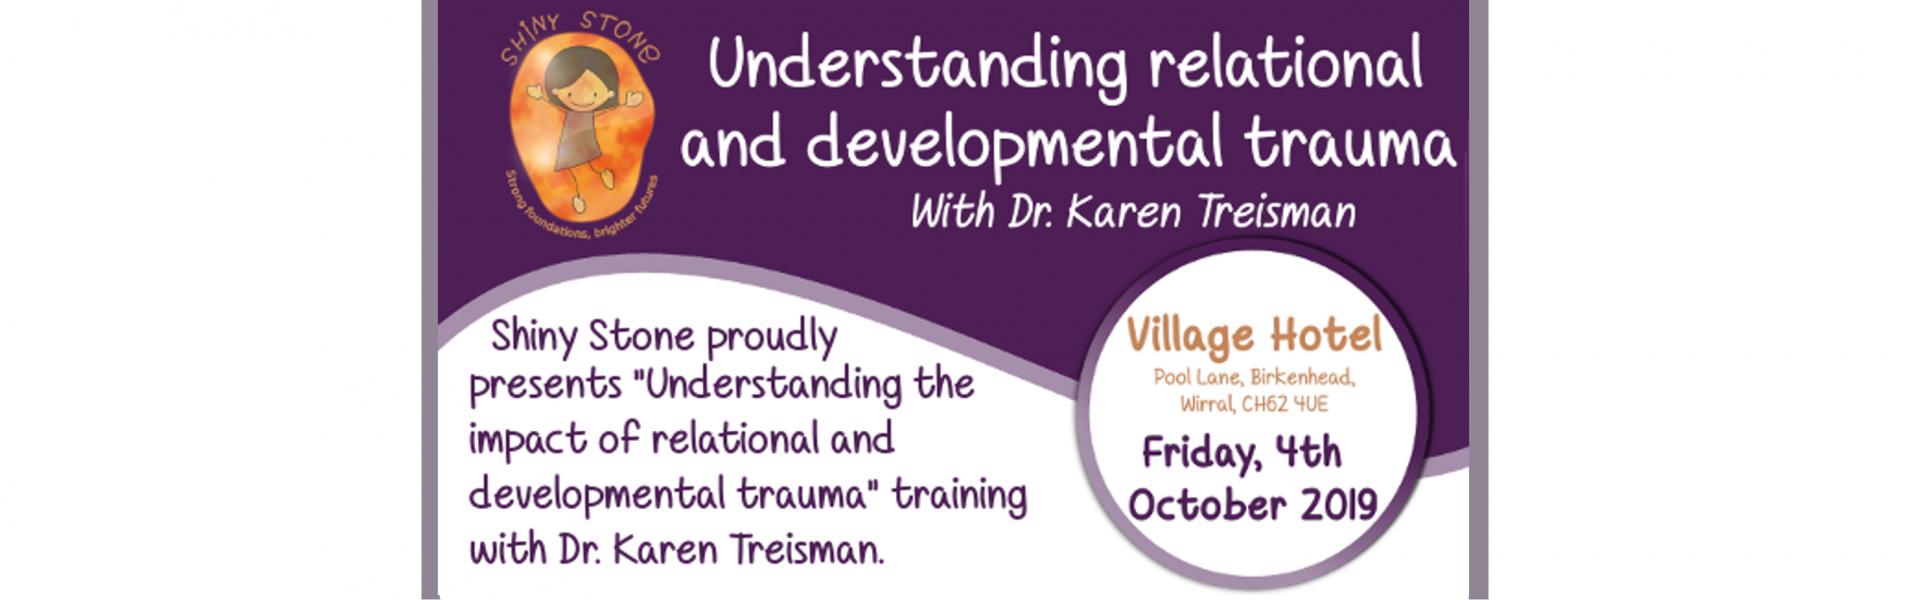 Understanding relational and developmental trauma training